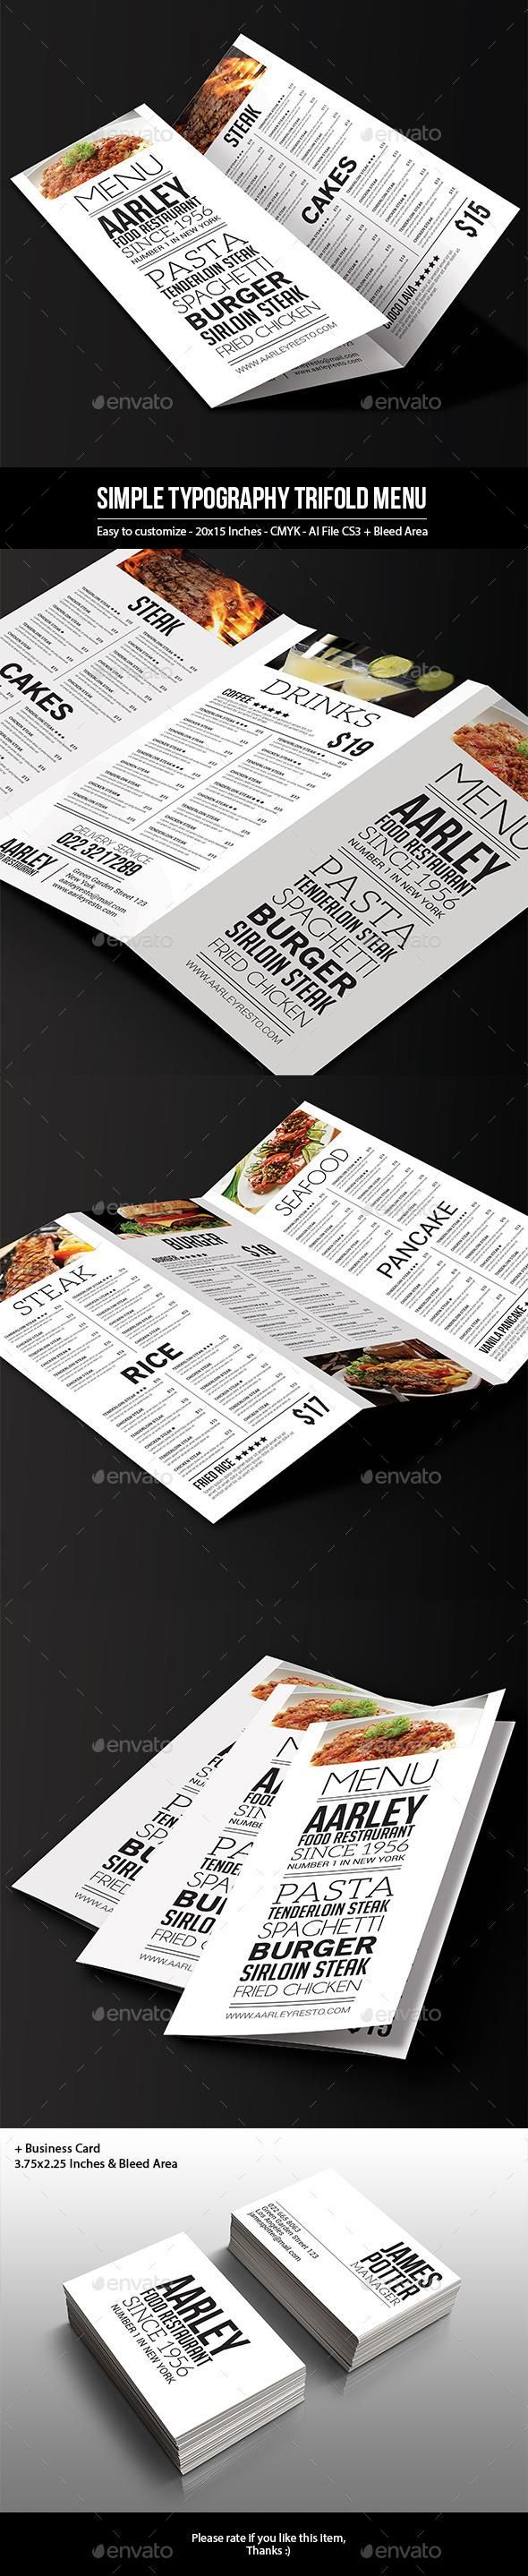 Simple Typography Trifold Menu 13 best Brochure